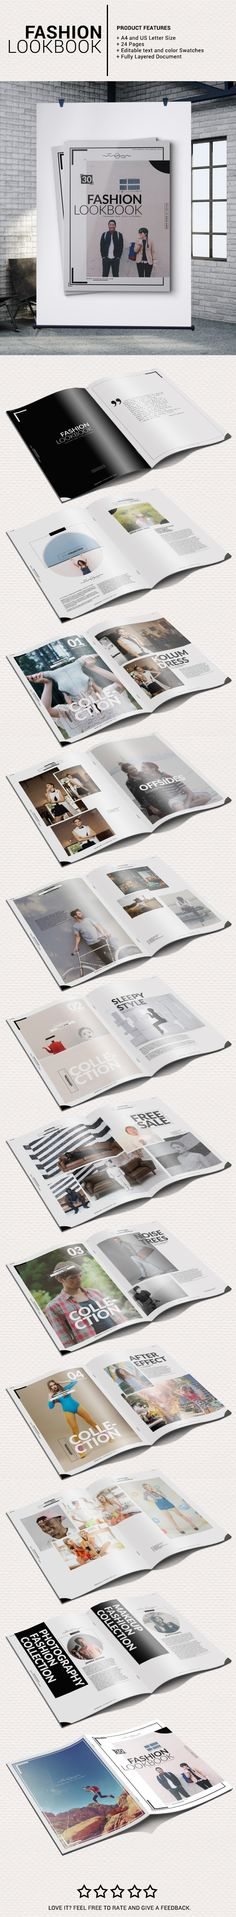 Fashion Lookbook on Behance